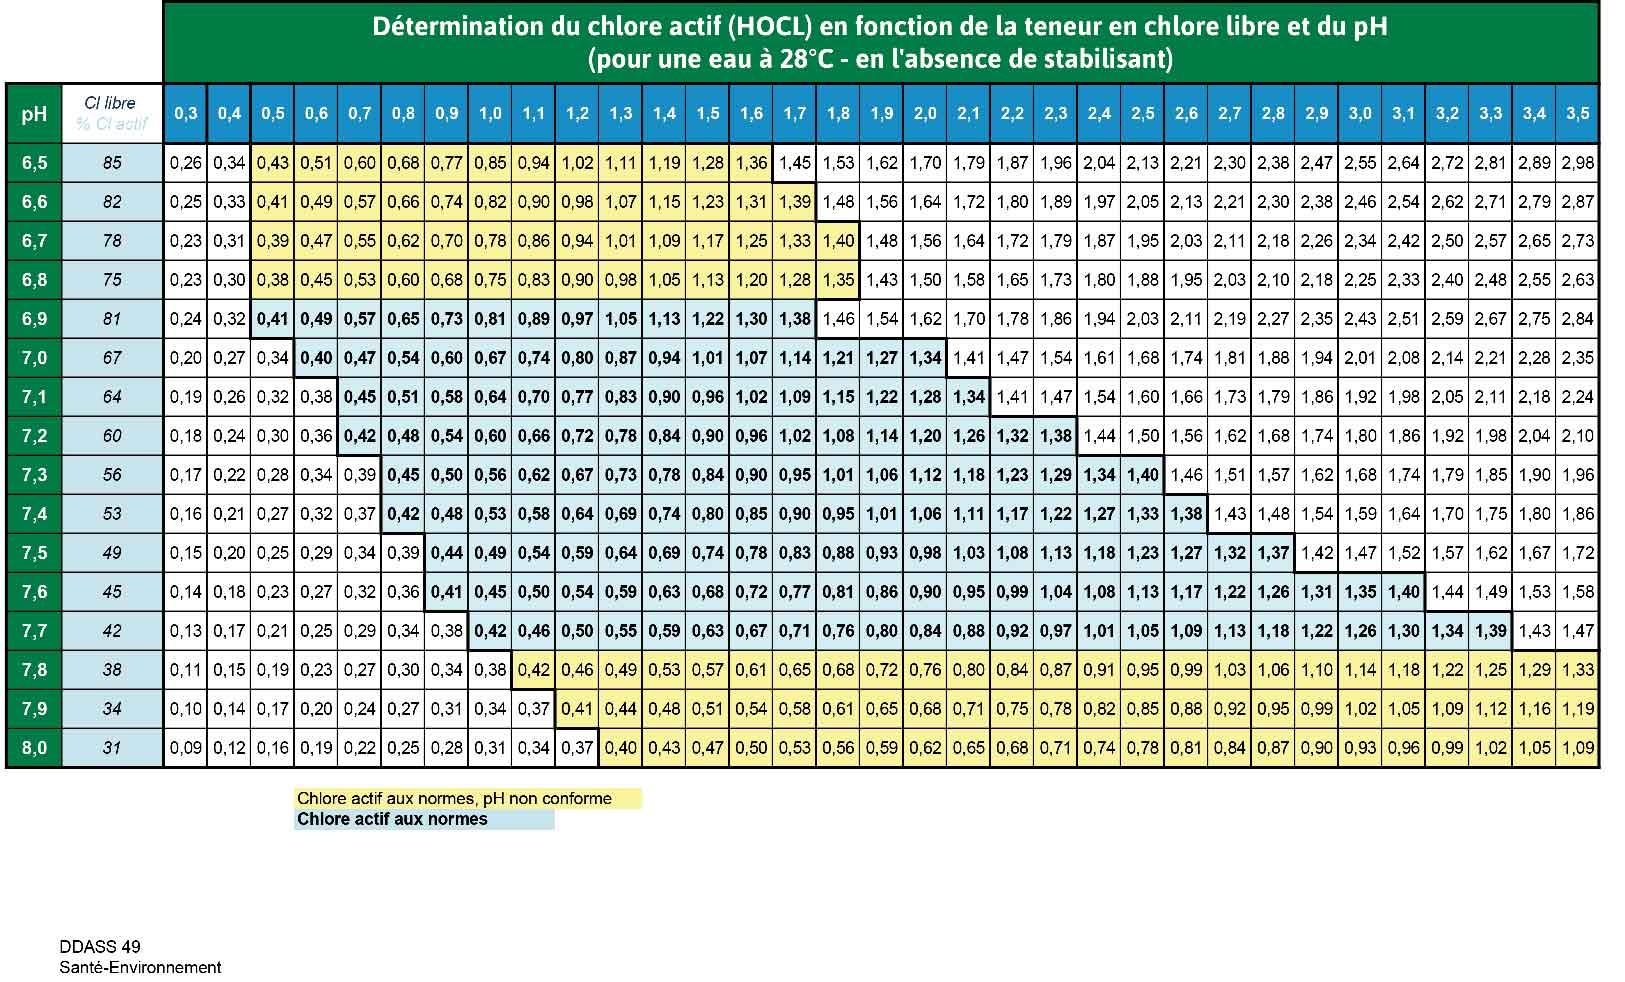 tableau chlore actif pH